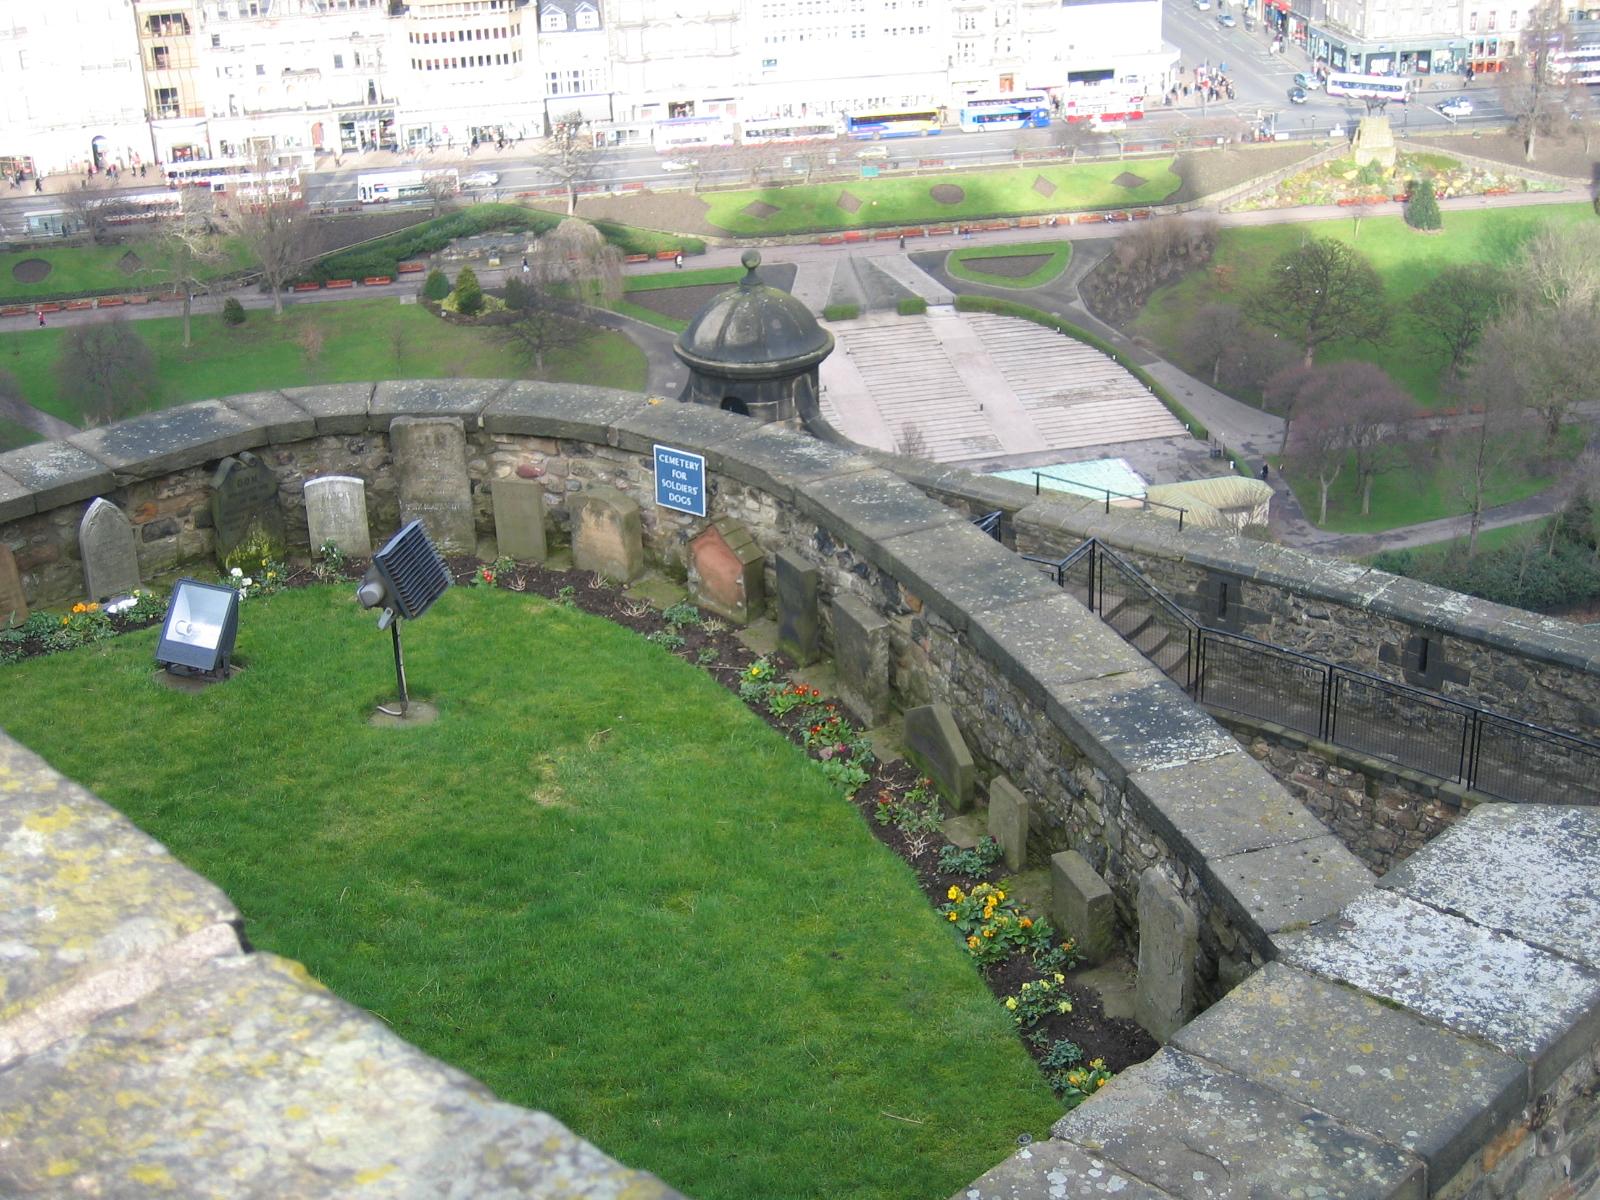 Soldiers' dog cemetery at Edinburgh Castle